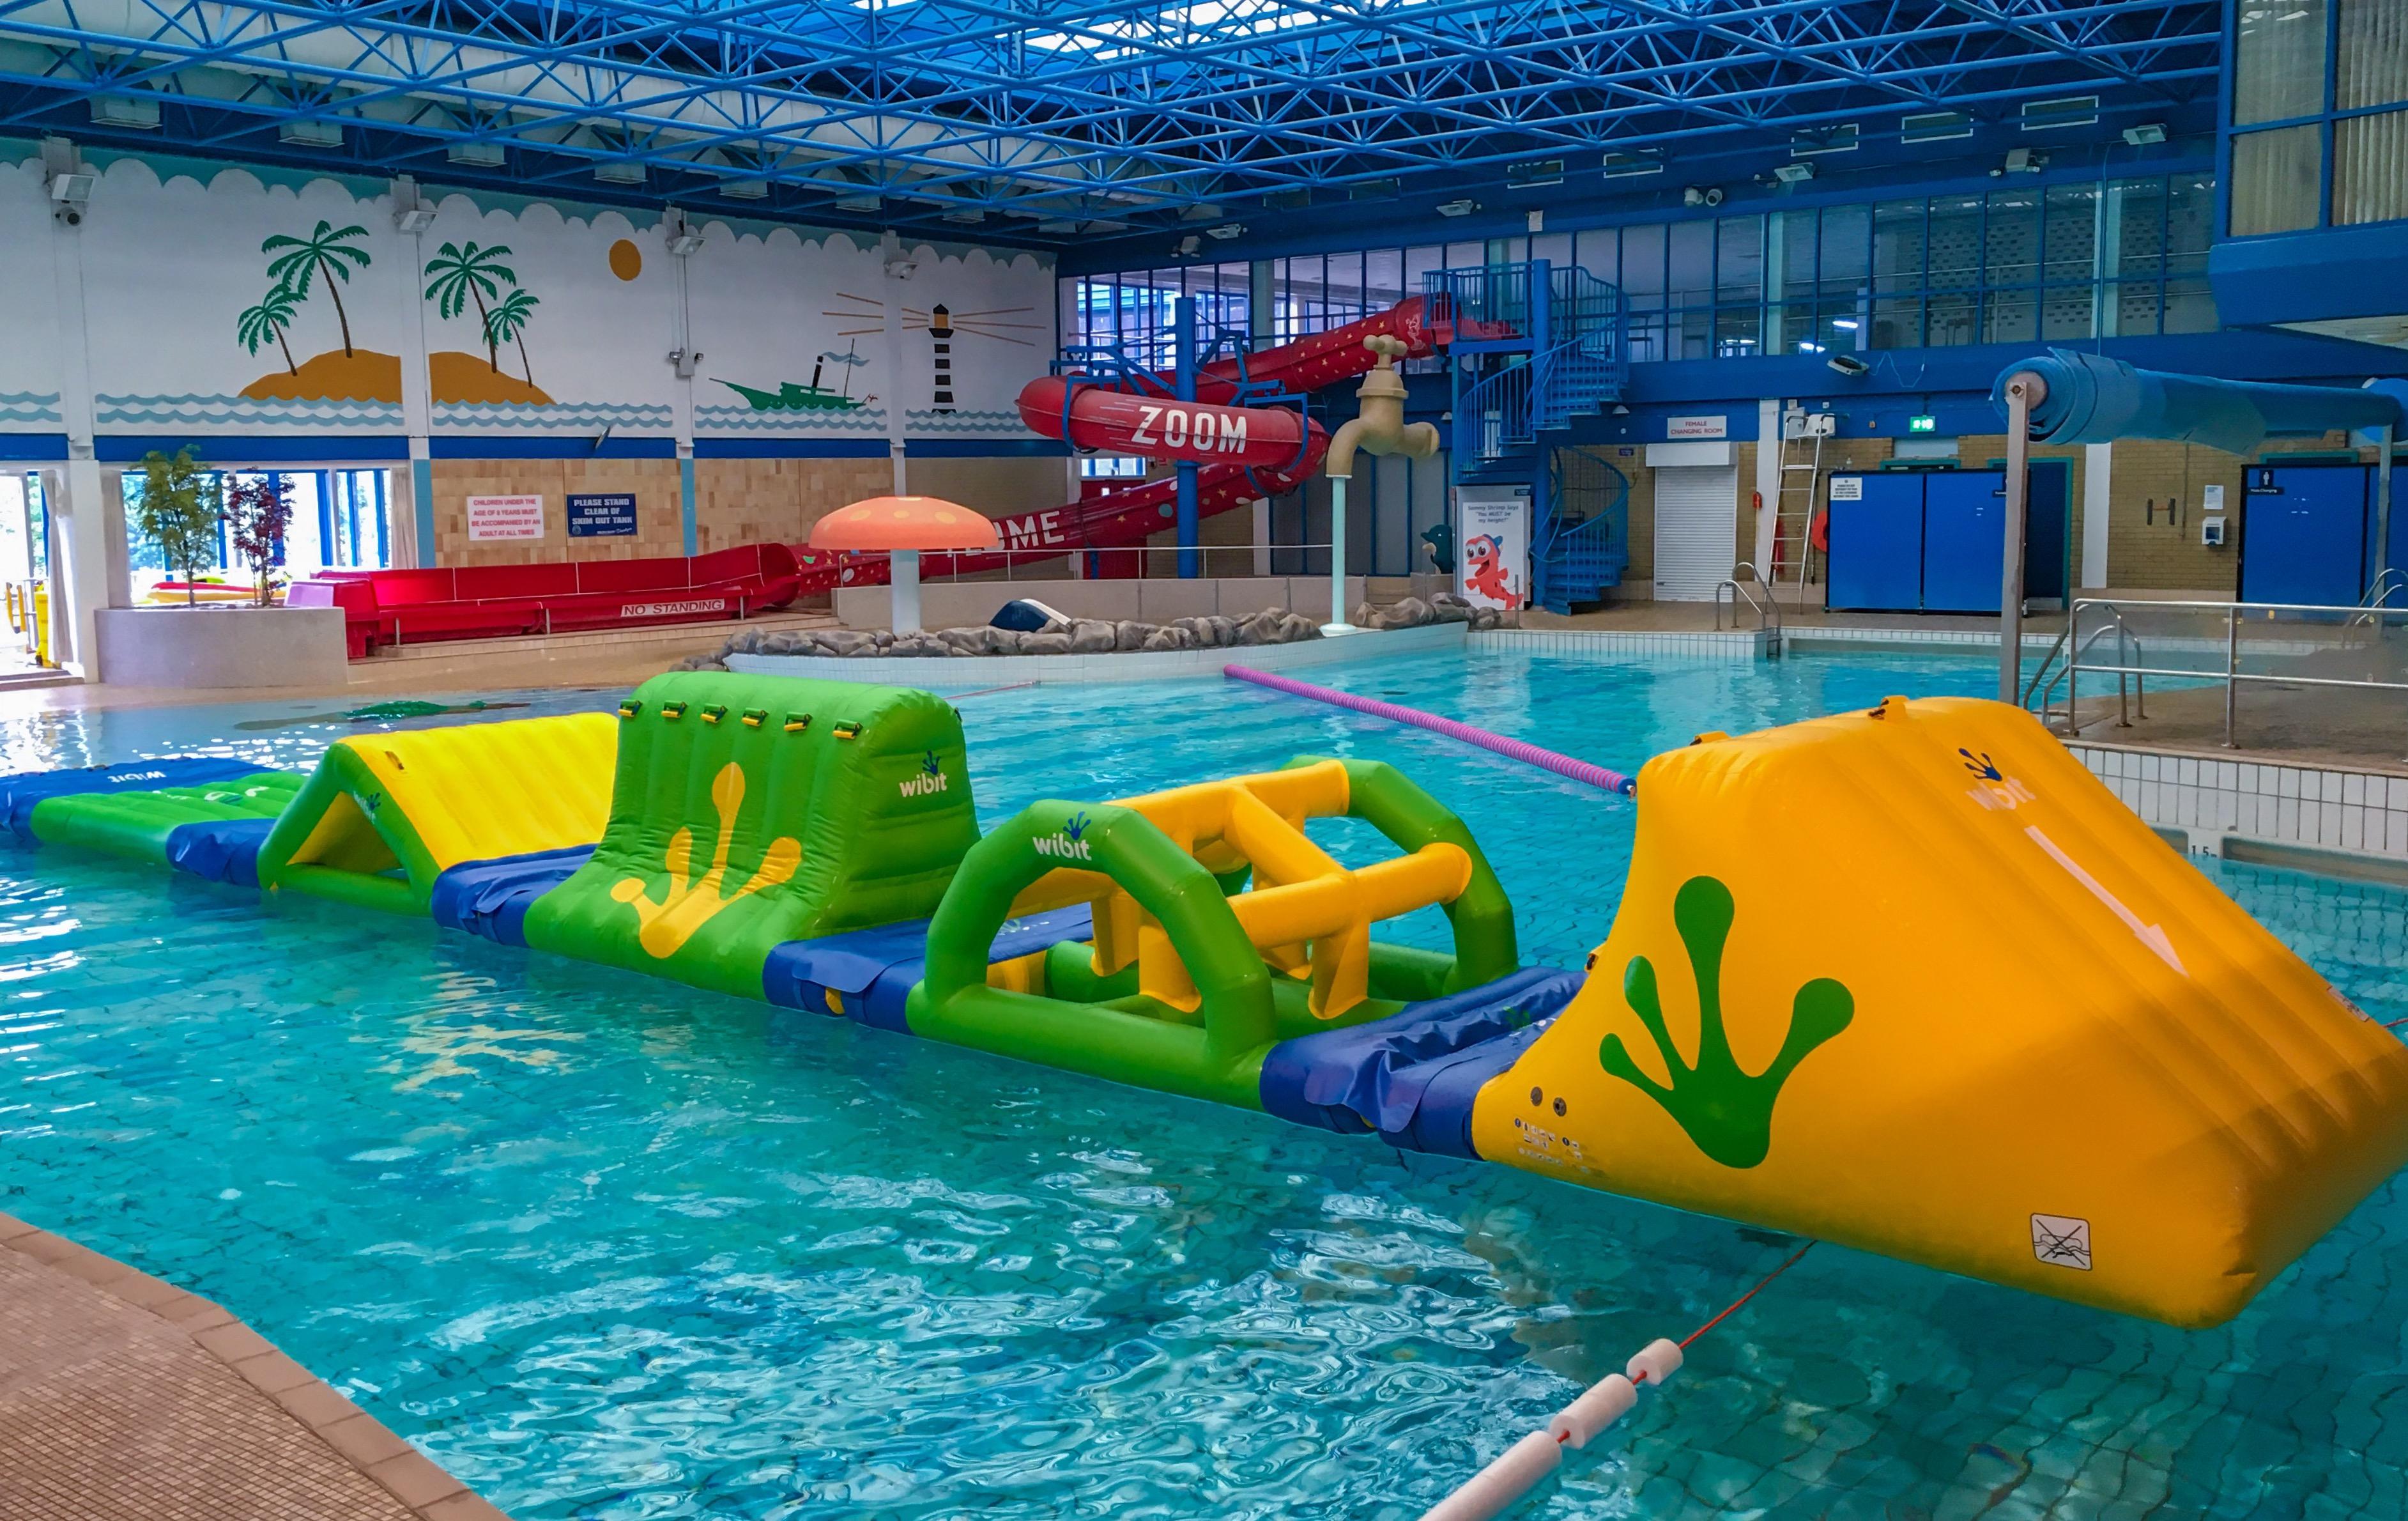 Swimming pool belfast better shankill leisure centre - Bray swimming pool and leisure centre ...